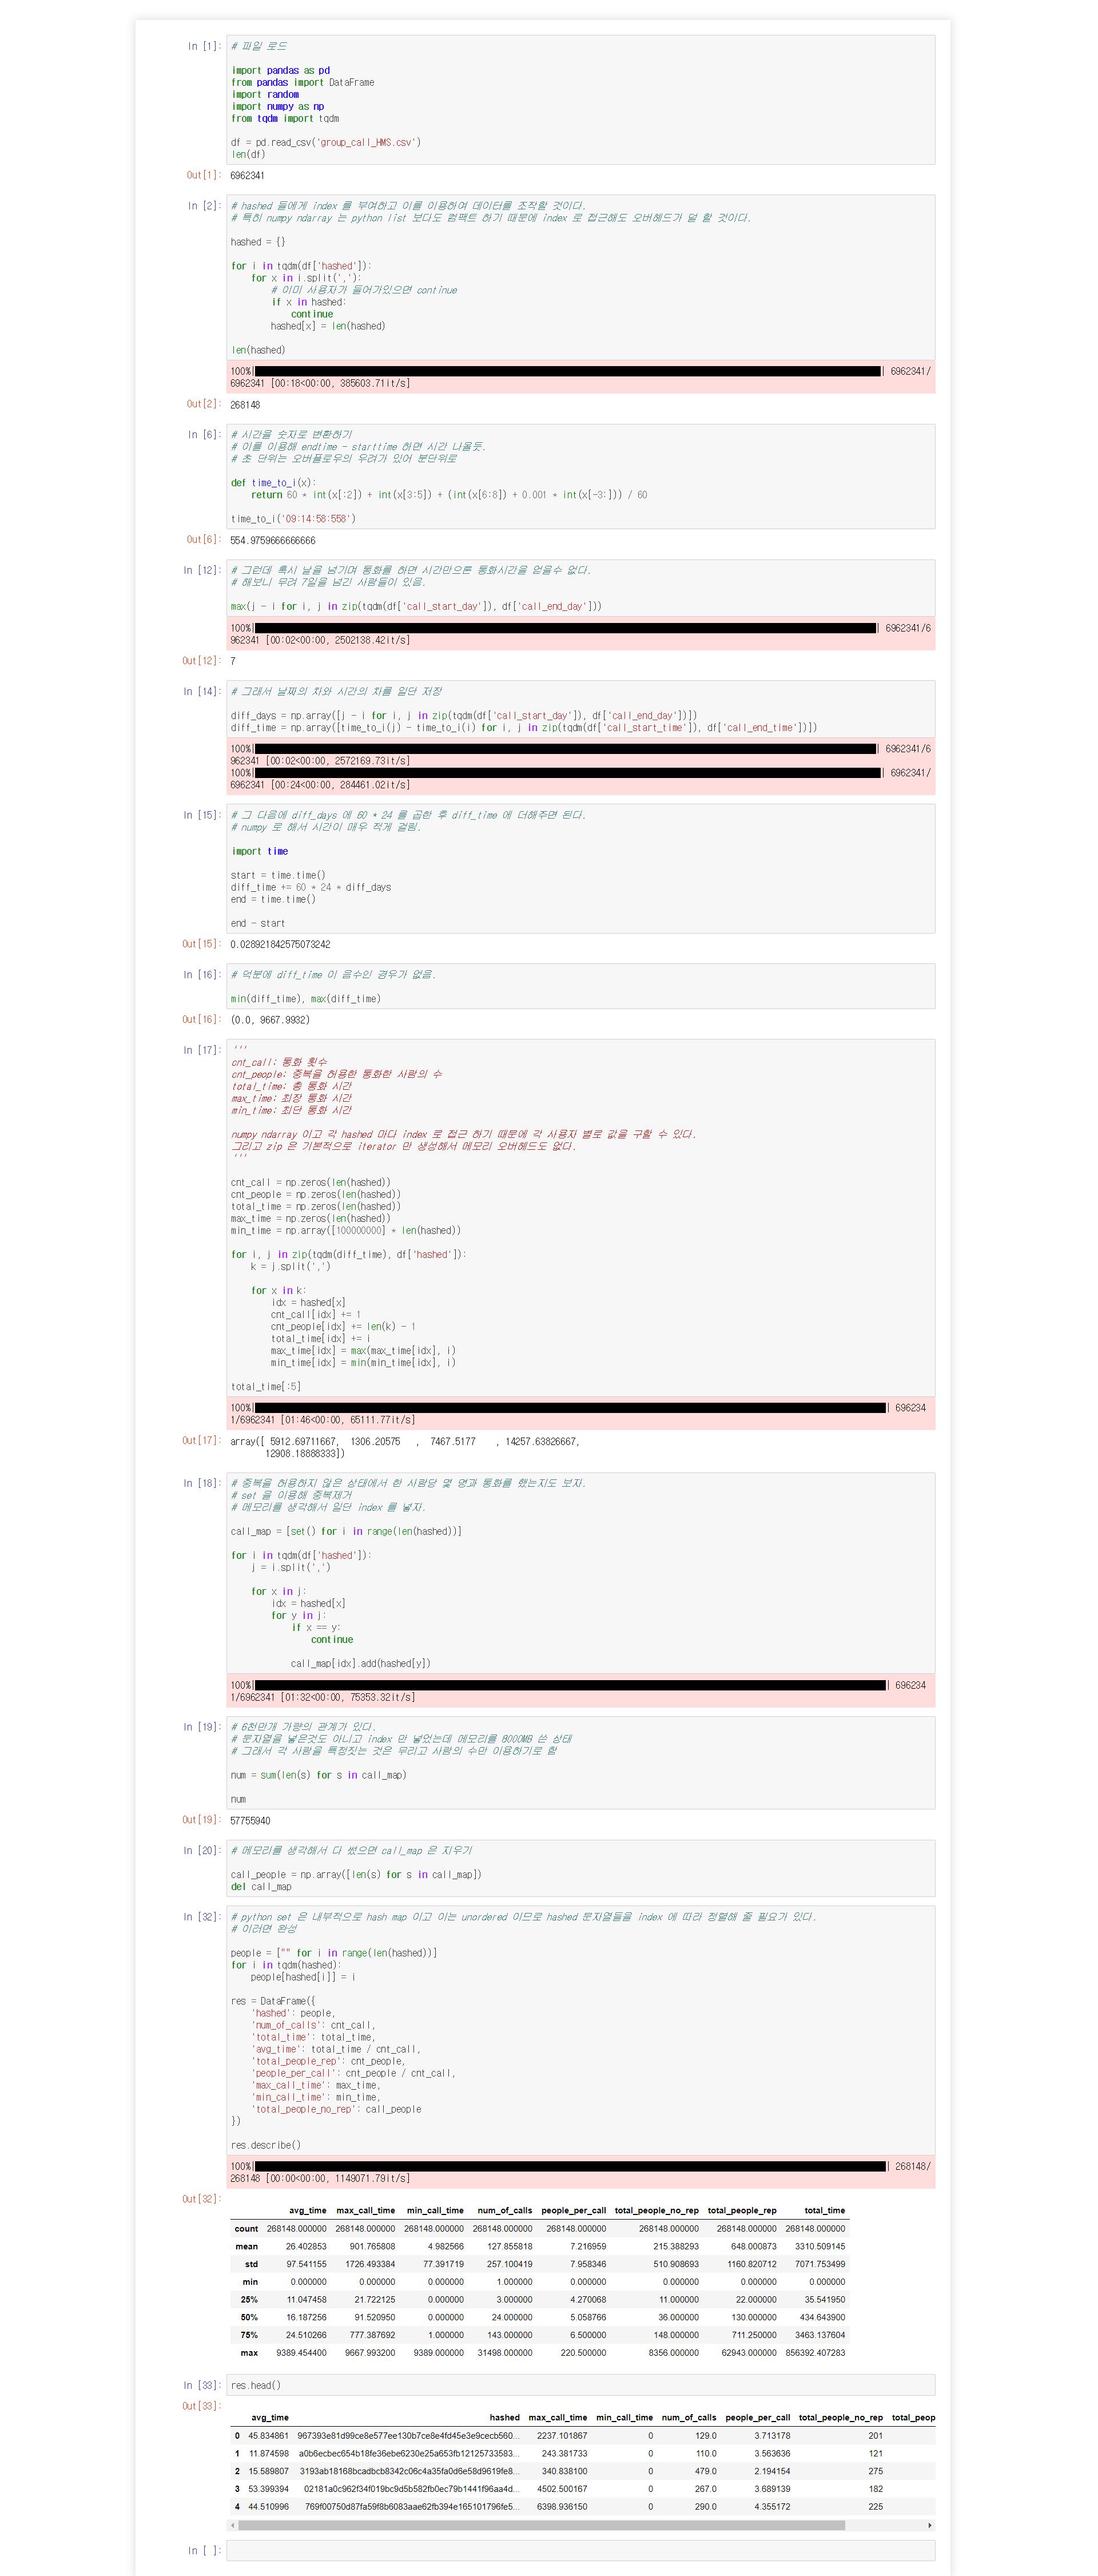 screencapture-file-C-Users-Jaeyeon-Han-Desktop-projects-tobigs-_7-_-algo6-html-2019-03-20-23_24_59.png